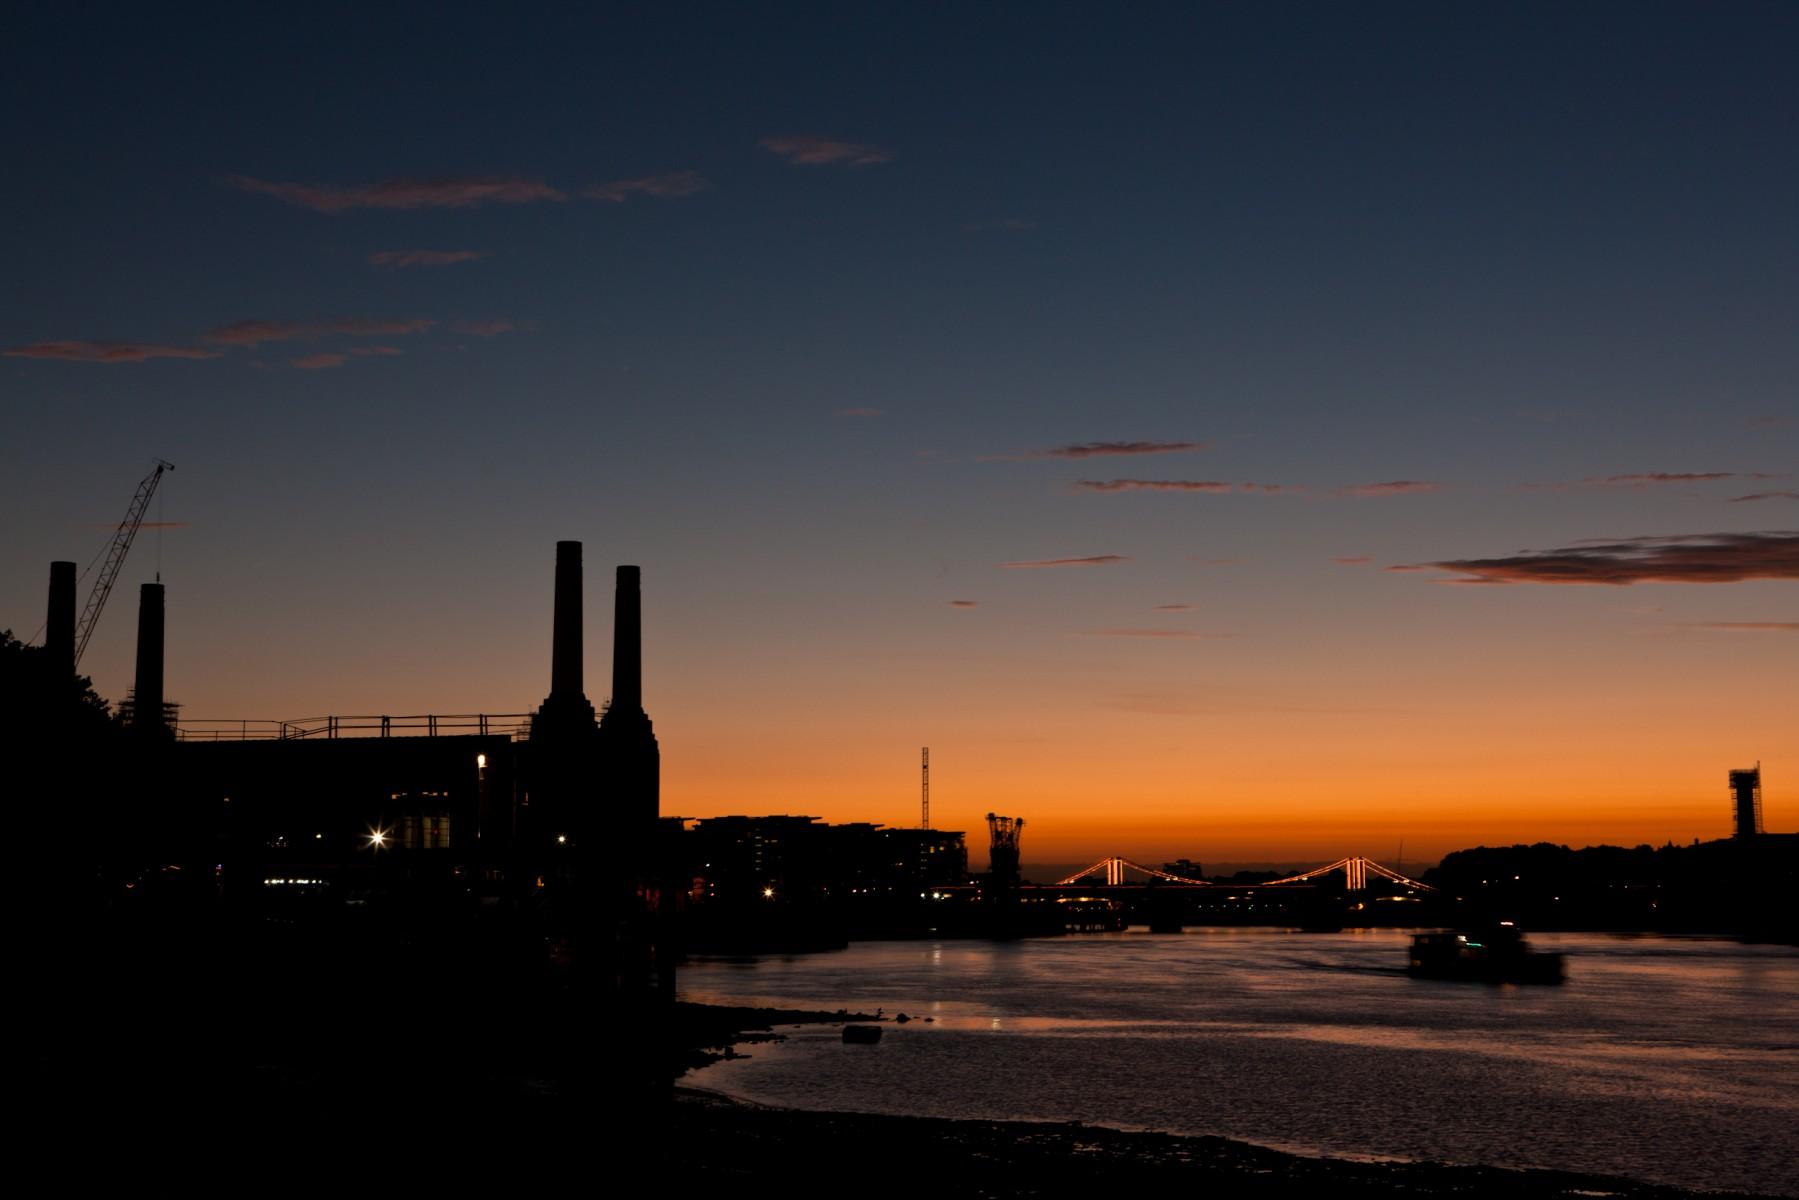 Silhouette of Battersea Power Station